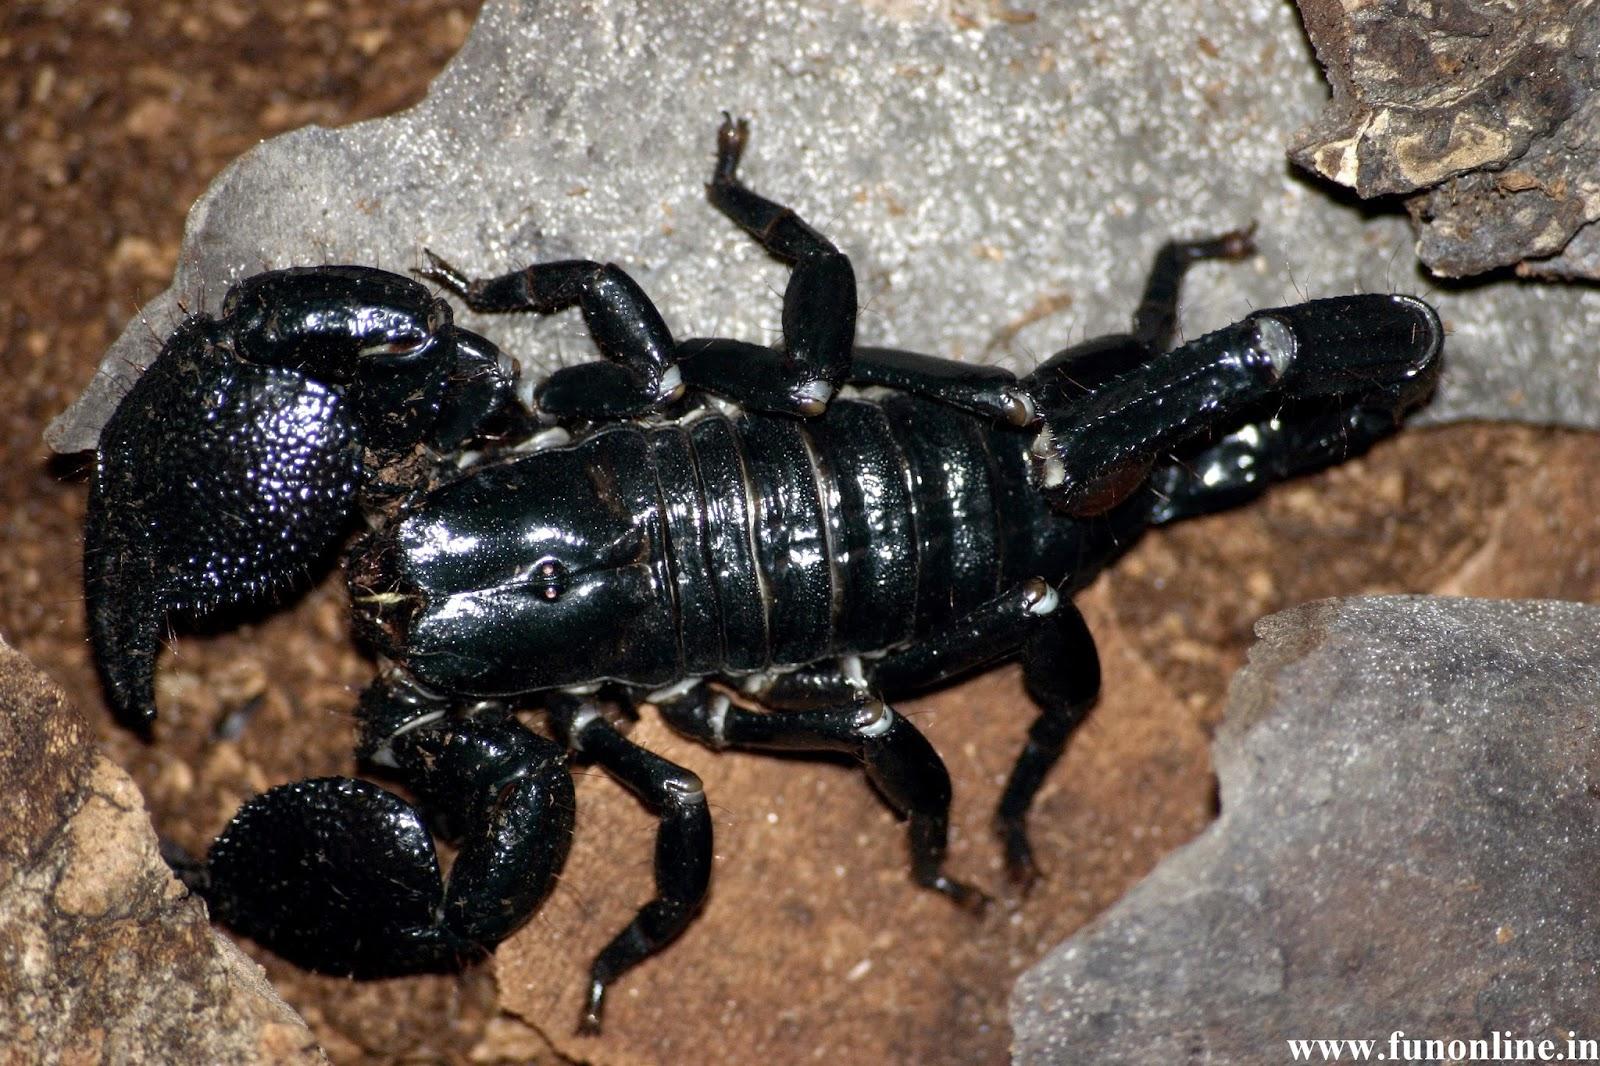 Black Scorpion HD Wallpapers